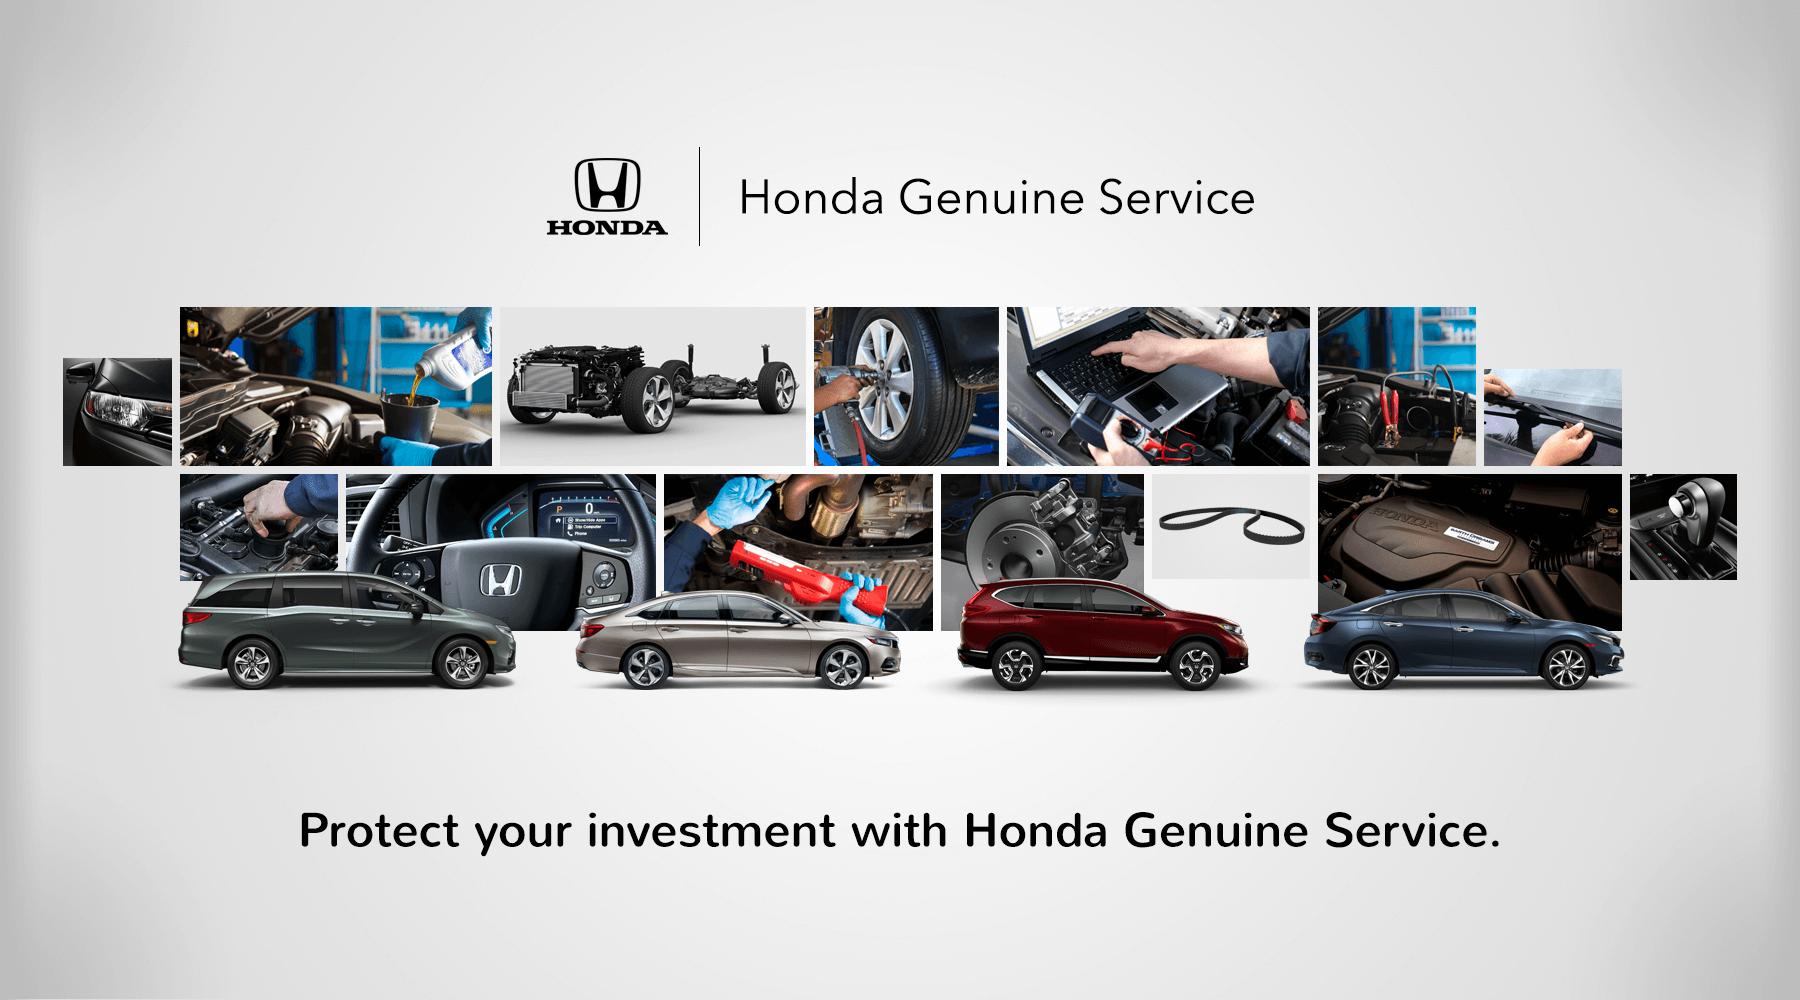 Honda Genuine Service Hawaii Honda Dealers HP Slide